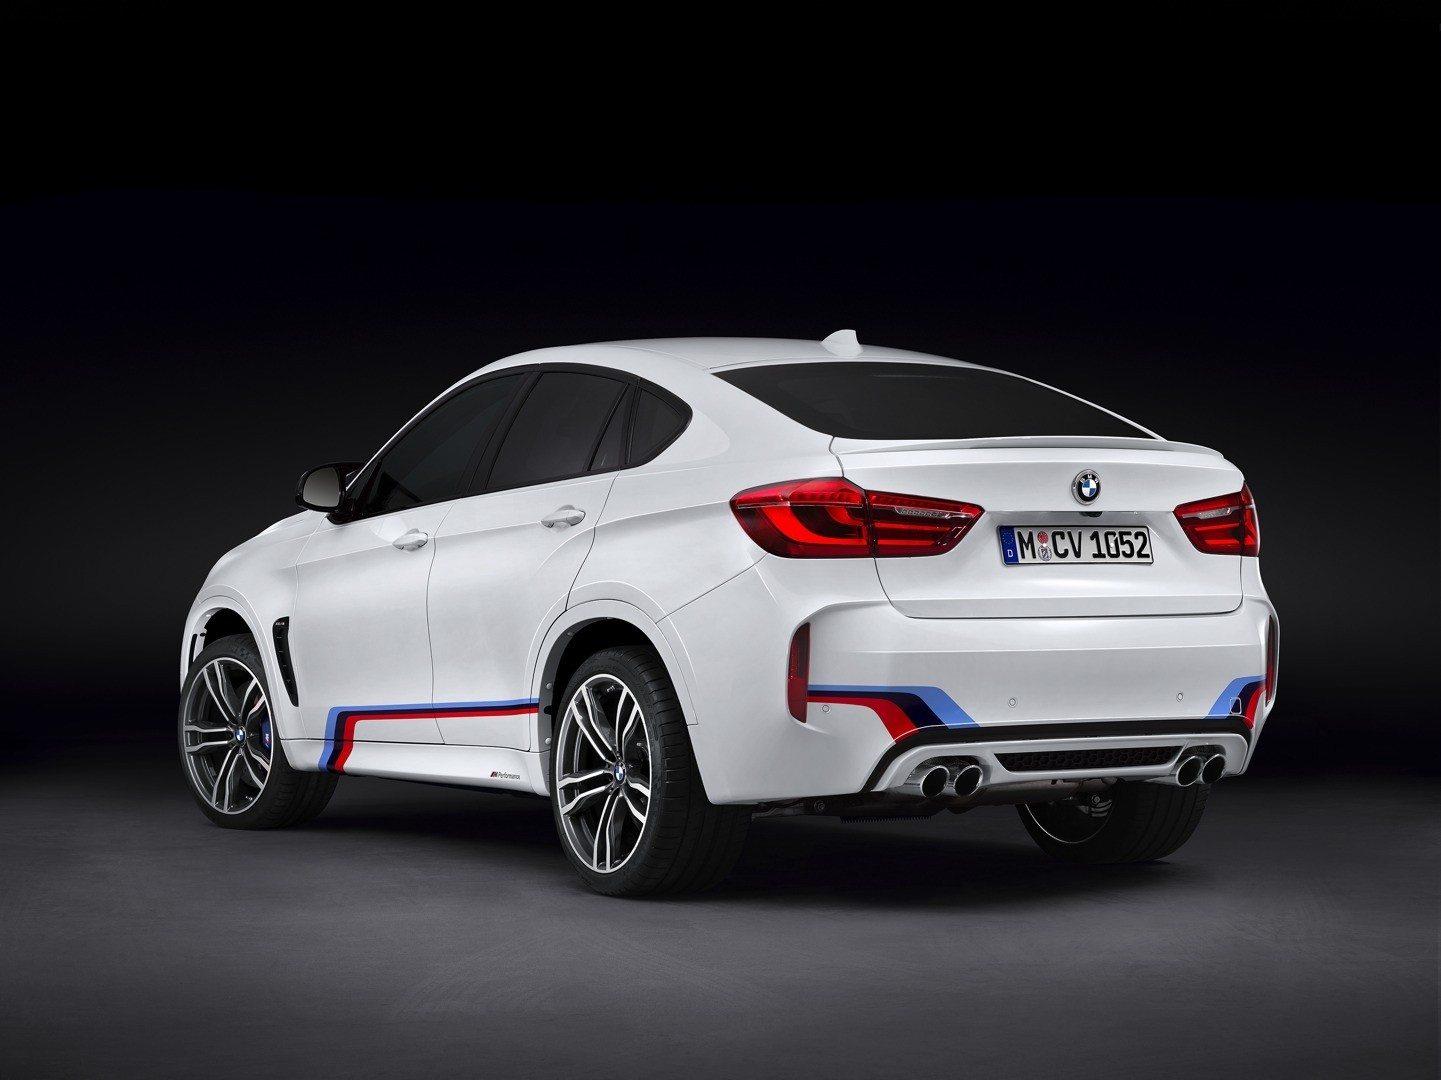 BMW X6 M - M Performance Parts